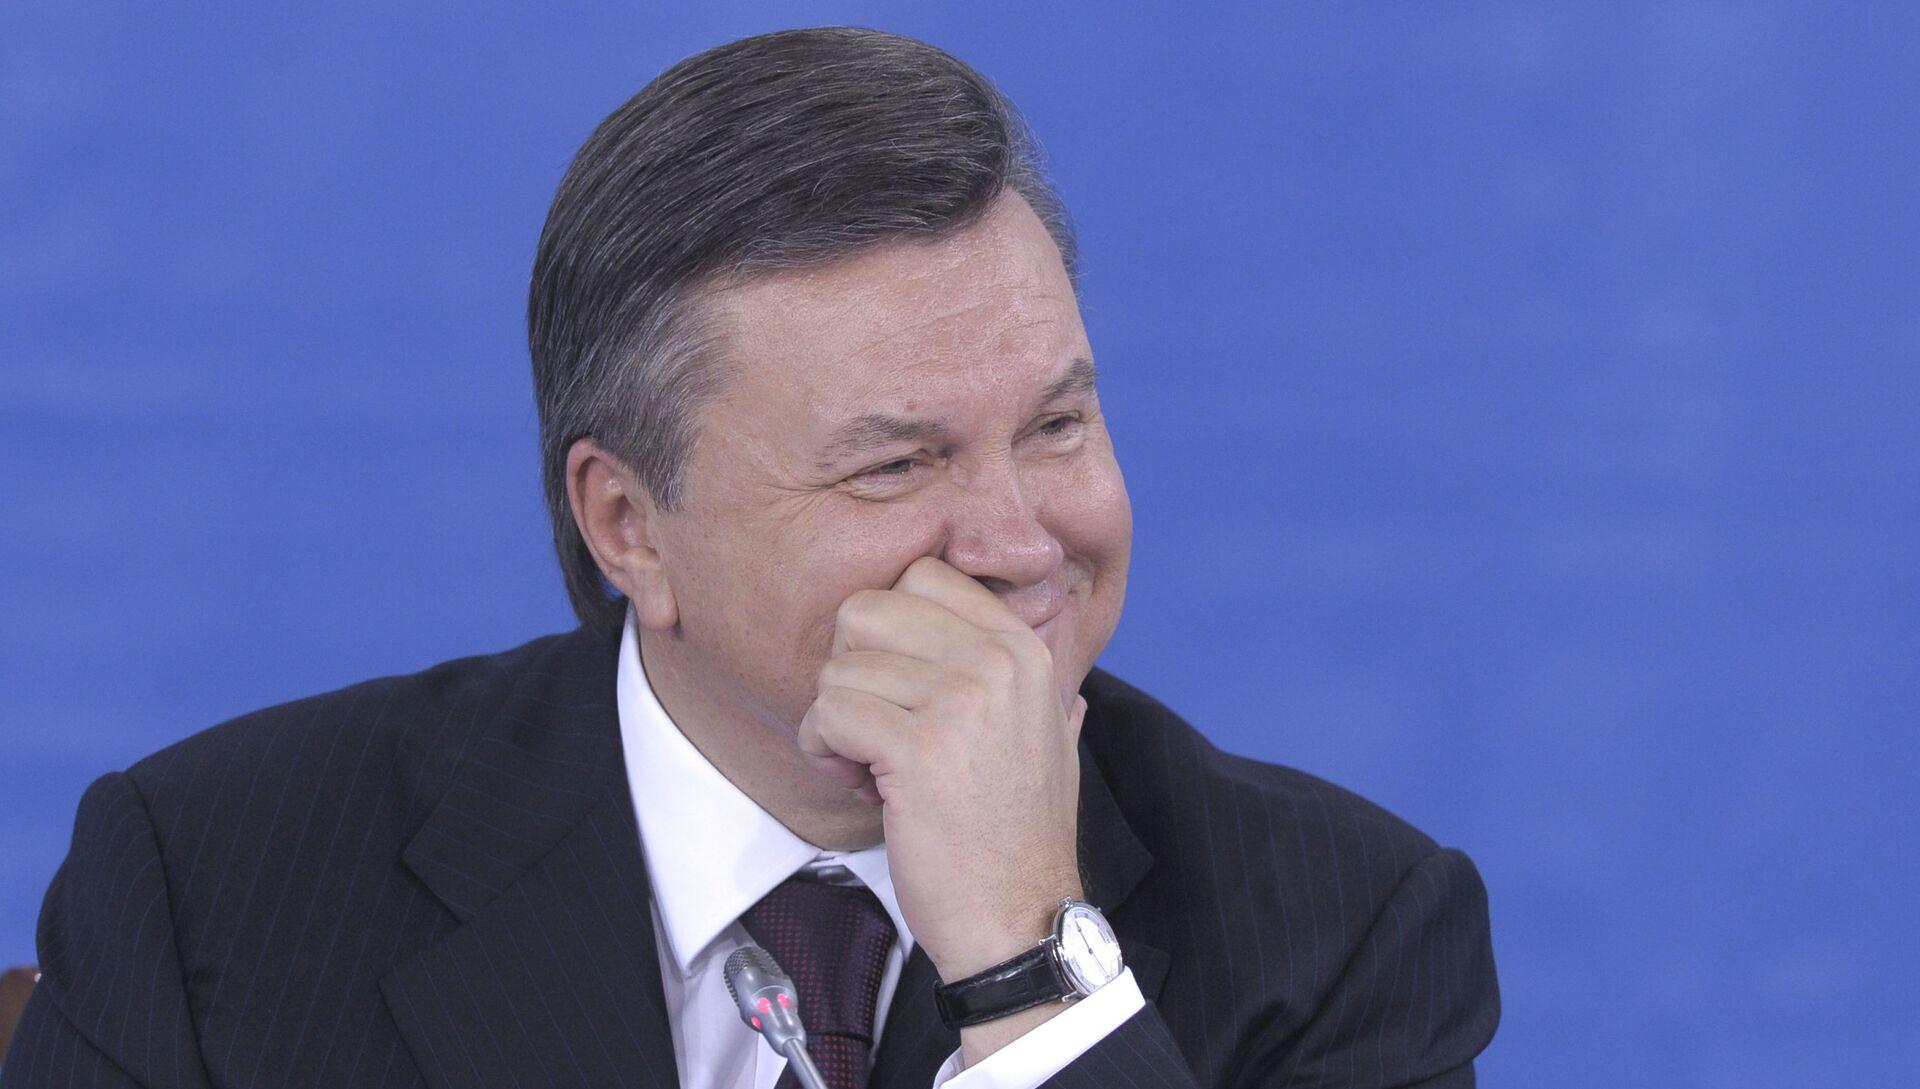 Президент Украины (2010-2014) Виктор Янукович - РИА Новости, 1920, 16.11.2020